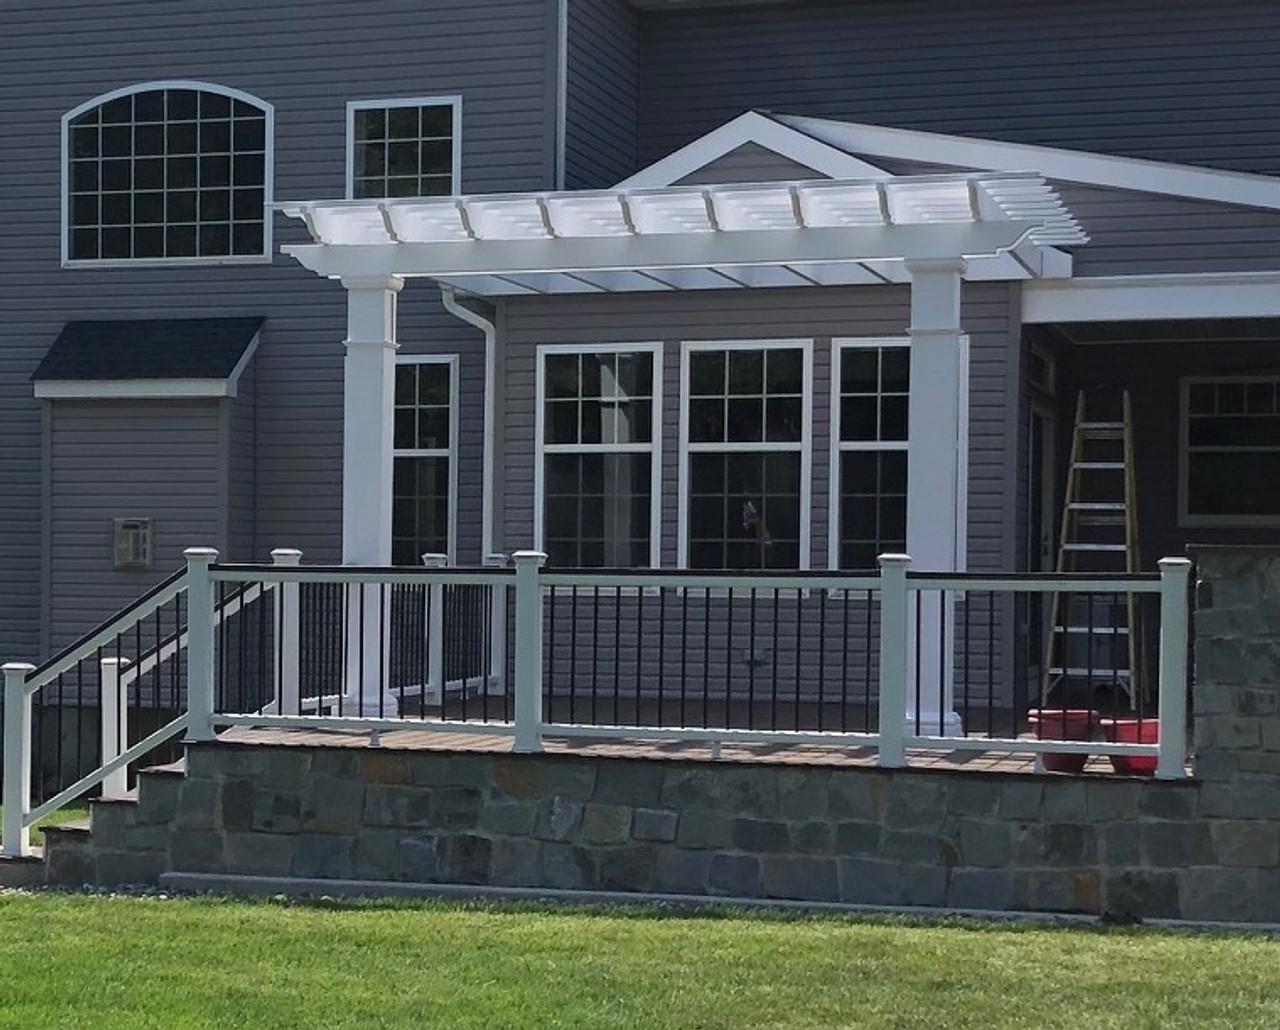 15x13 Structural Fiberglass Wall Mounted Pergola Kit, Robbinsville, NJ